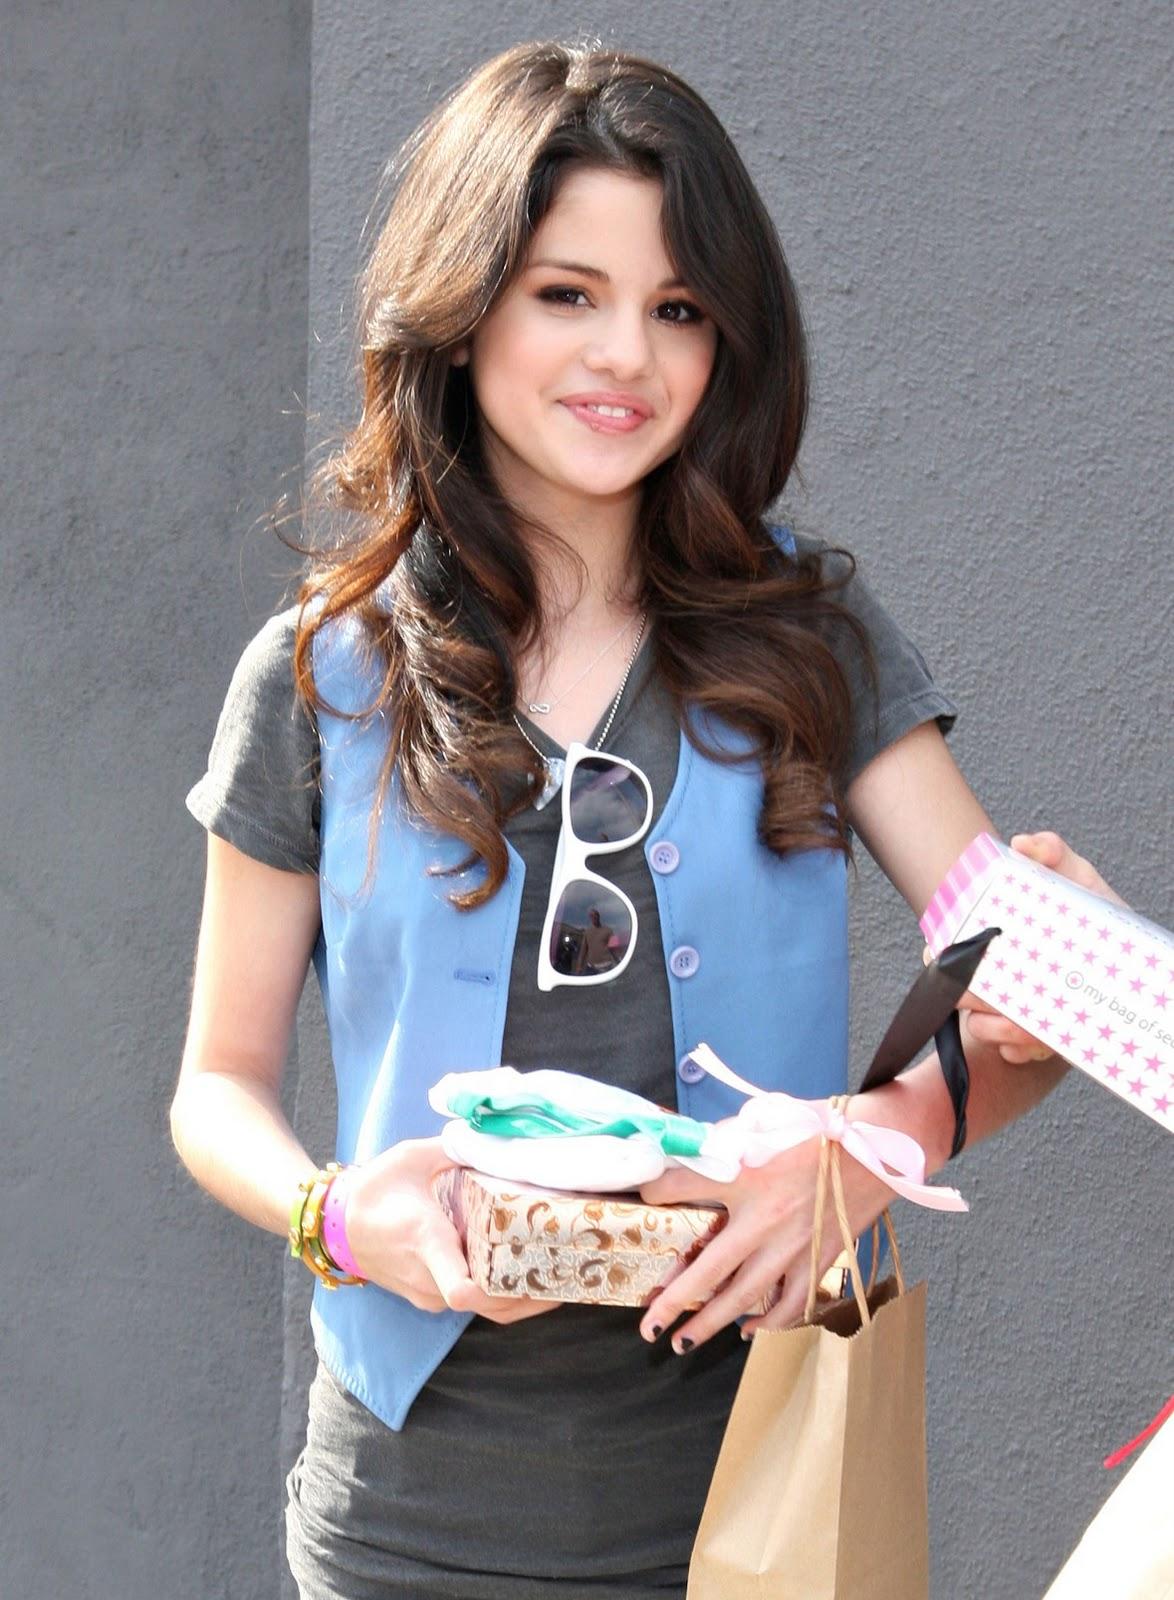 http://4.bp.blogspot.com/-5VjjGLq0R0A/ThTT_7s65ZI/AAAAAAAALPw/k7KvTC447mY/s1600/Selena%2BGomez%2B%252818%2529.jpg